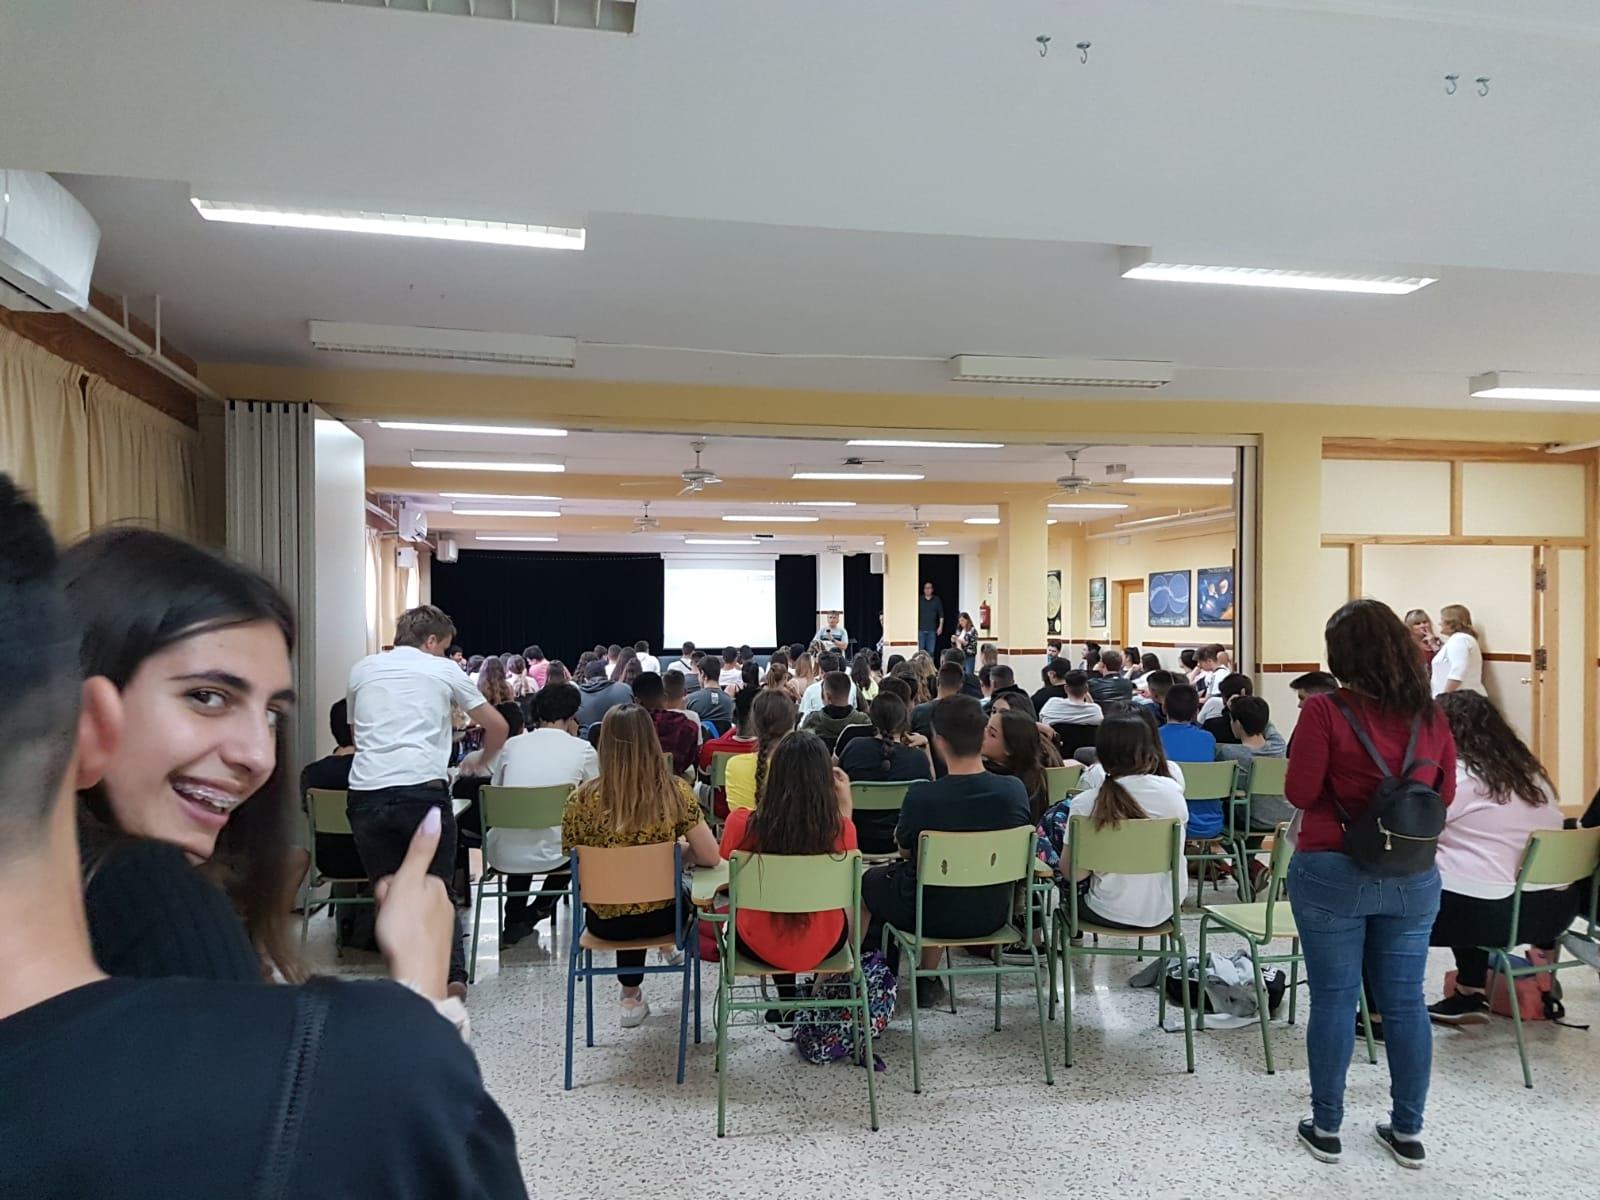 visita-CF-Motril-Salobreña-2019-07